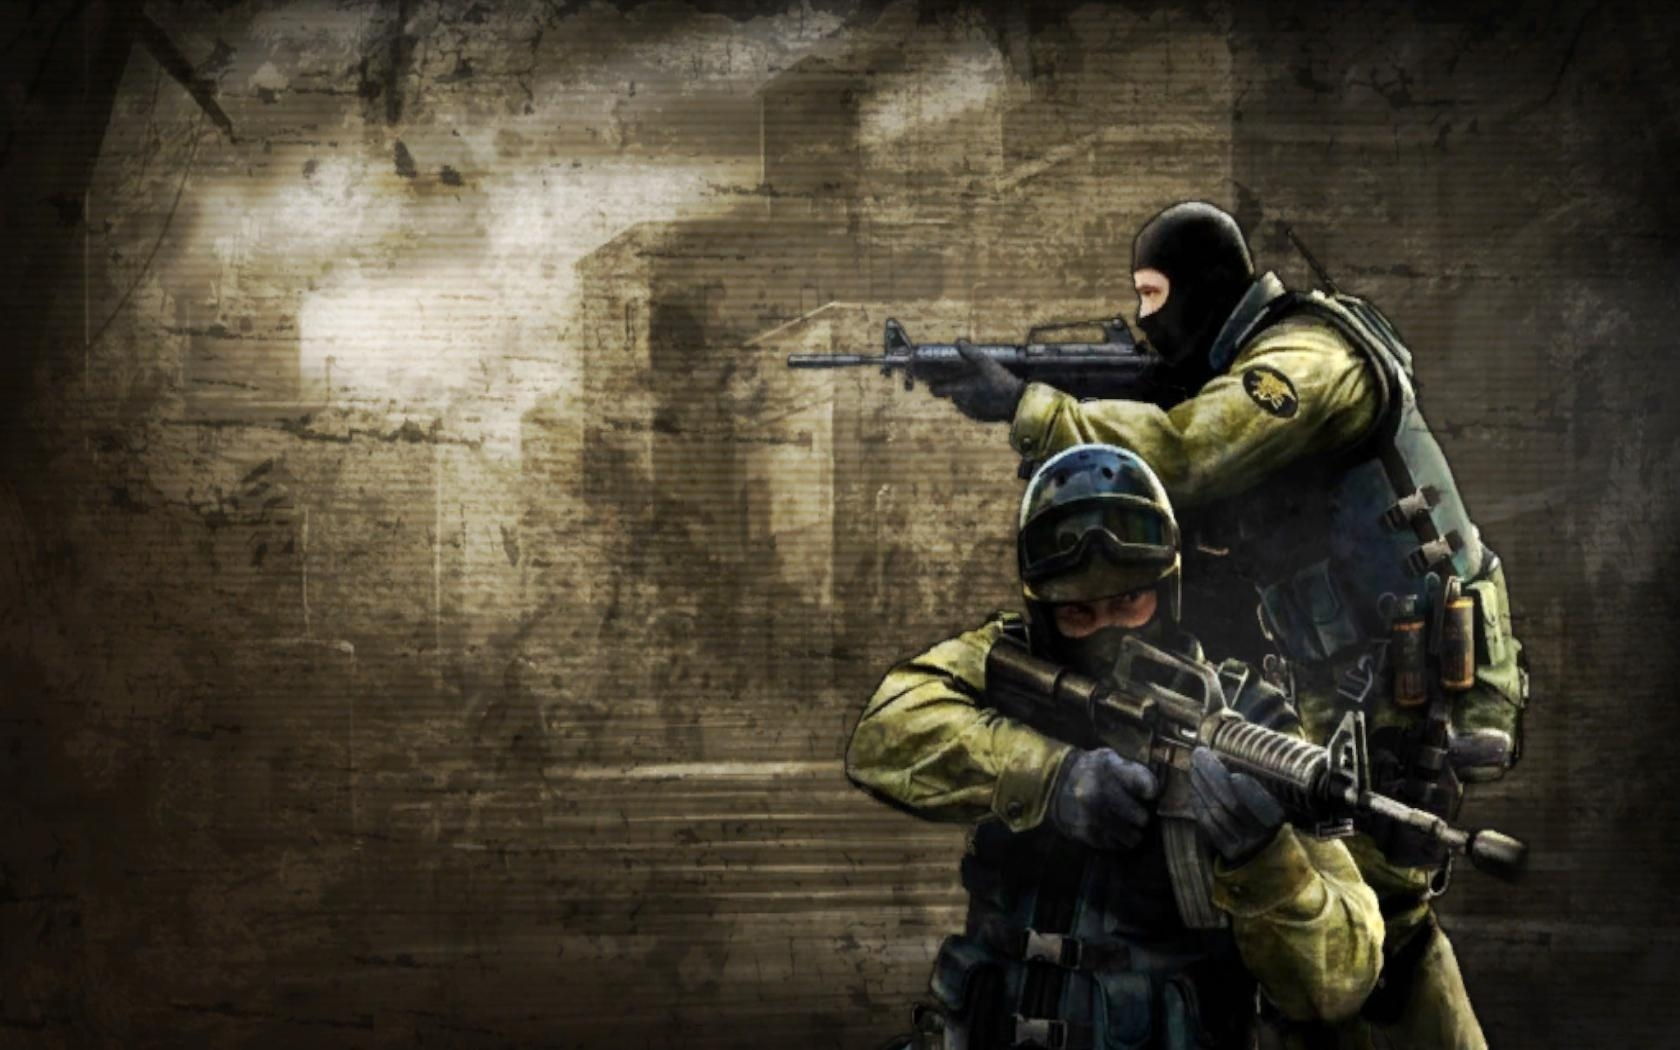 counter-strike: source hd desktop wallpapers | 7wallpapers